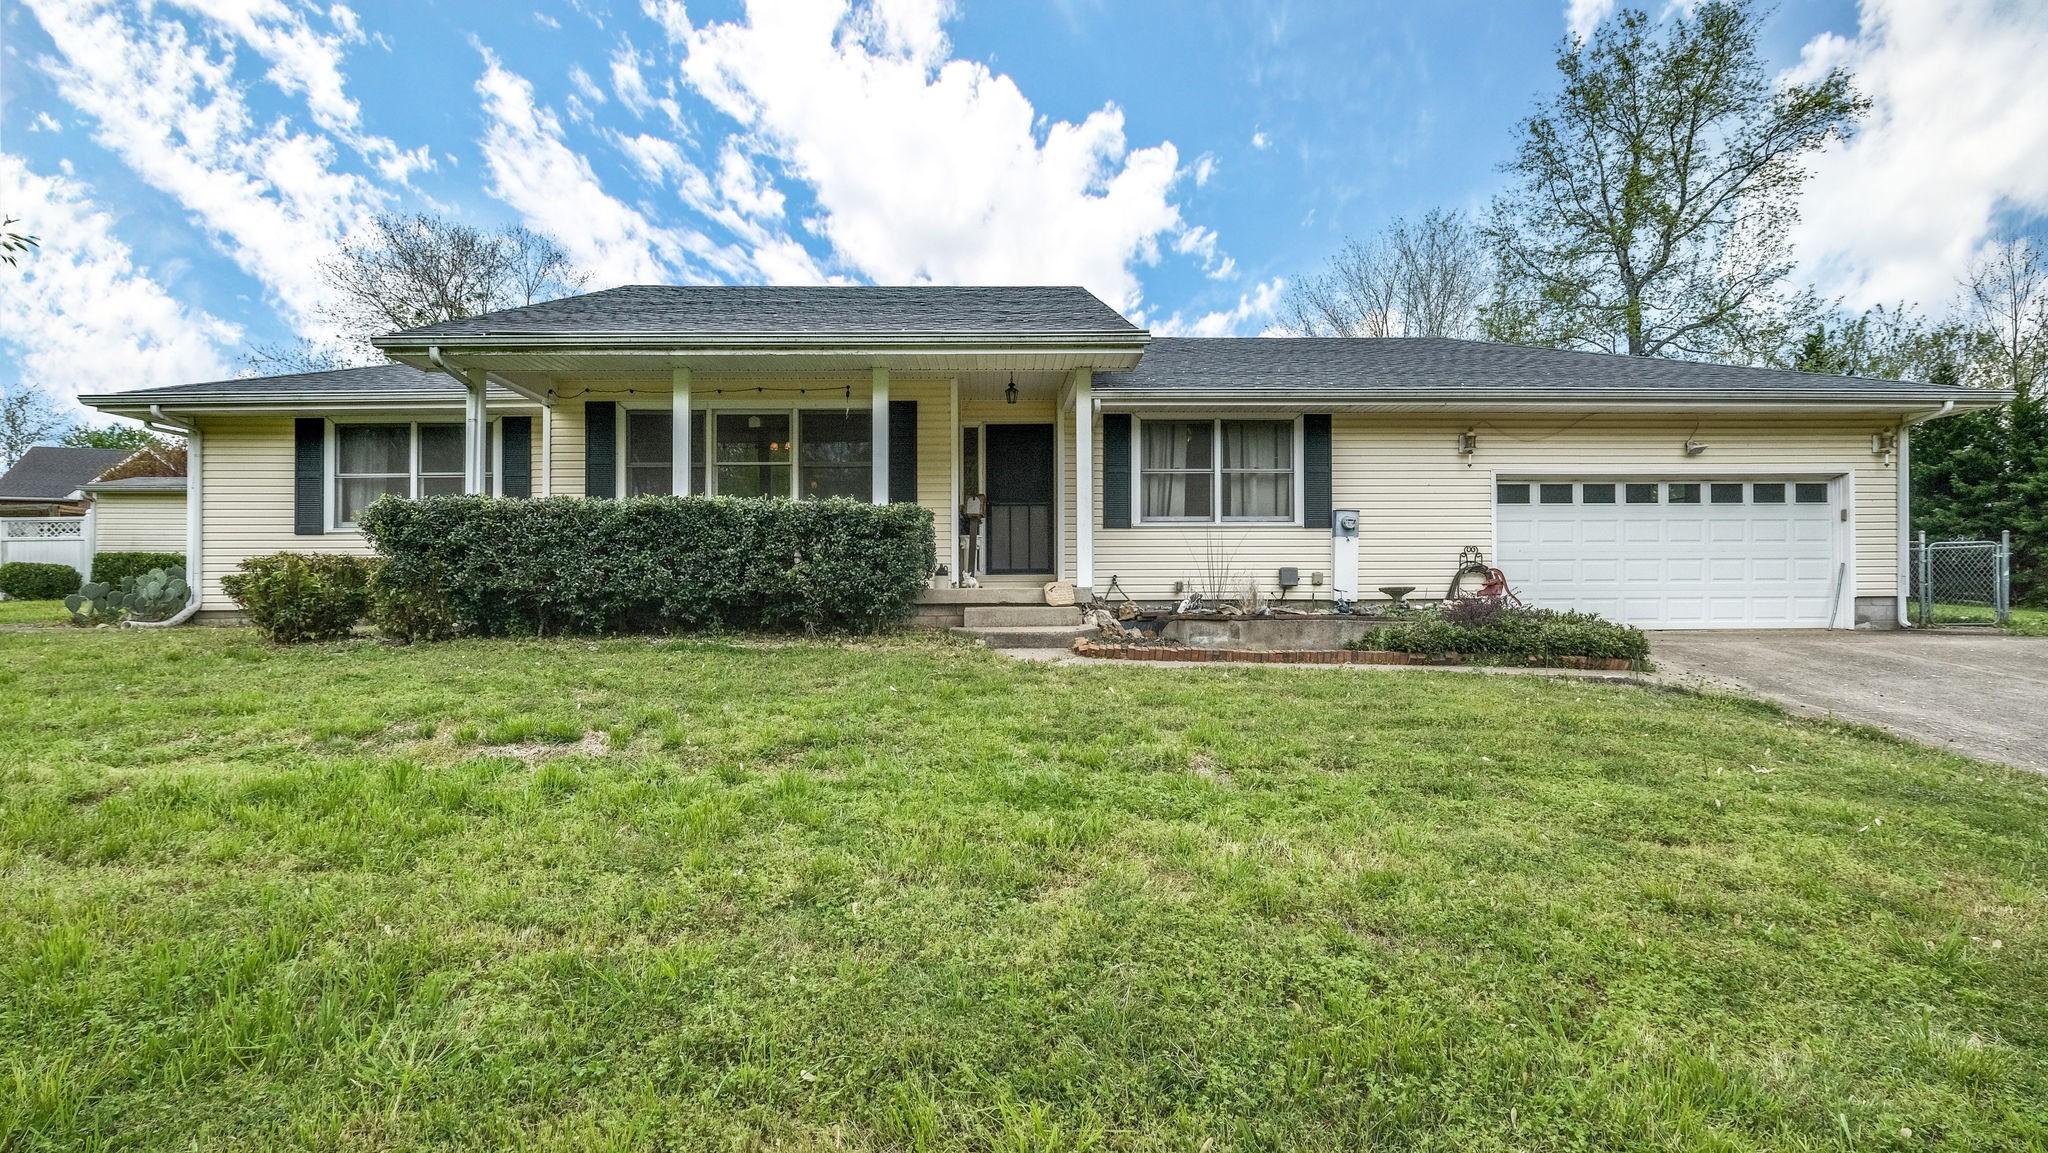 3008 Sweethome Rd, Chapmansboro, TN 37035 - Chapmansboro, TN real estate listing